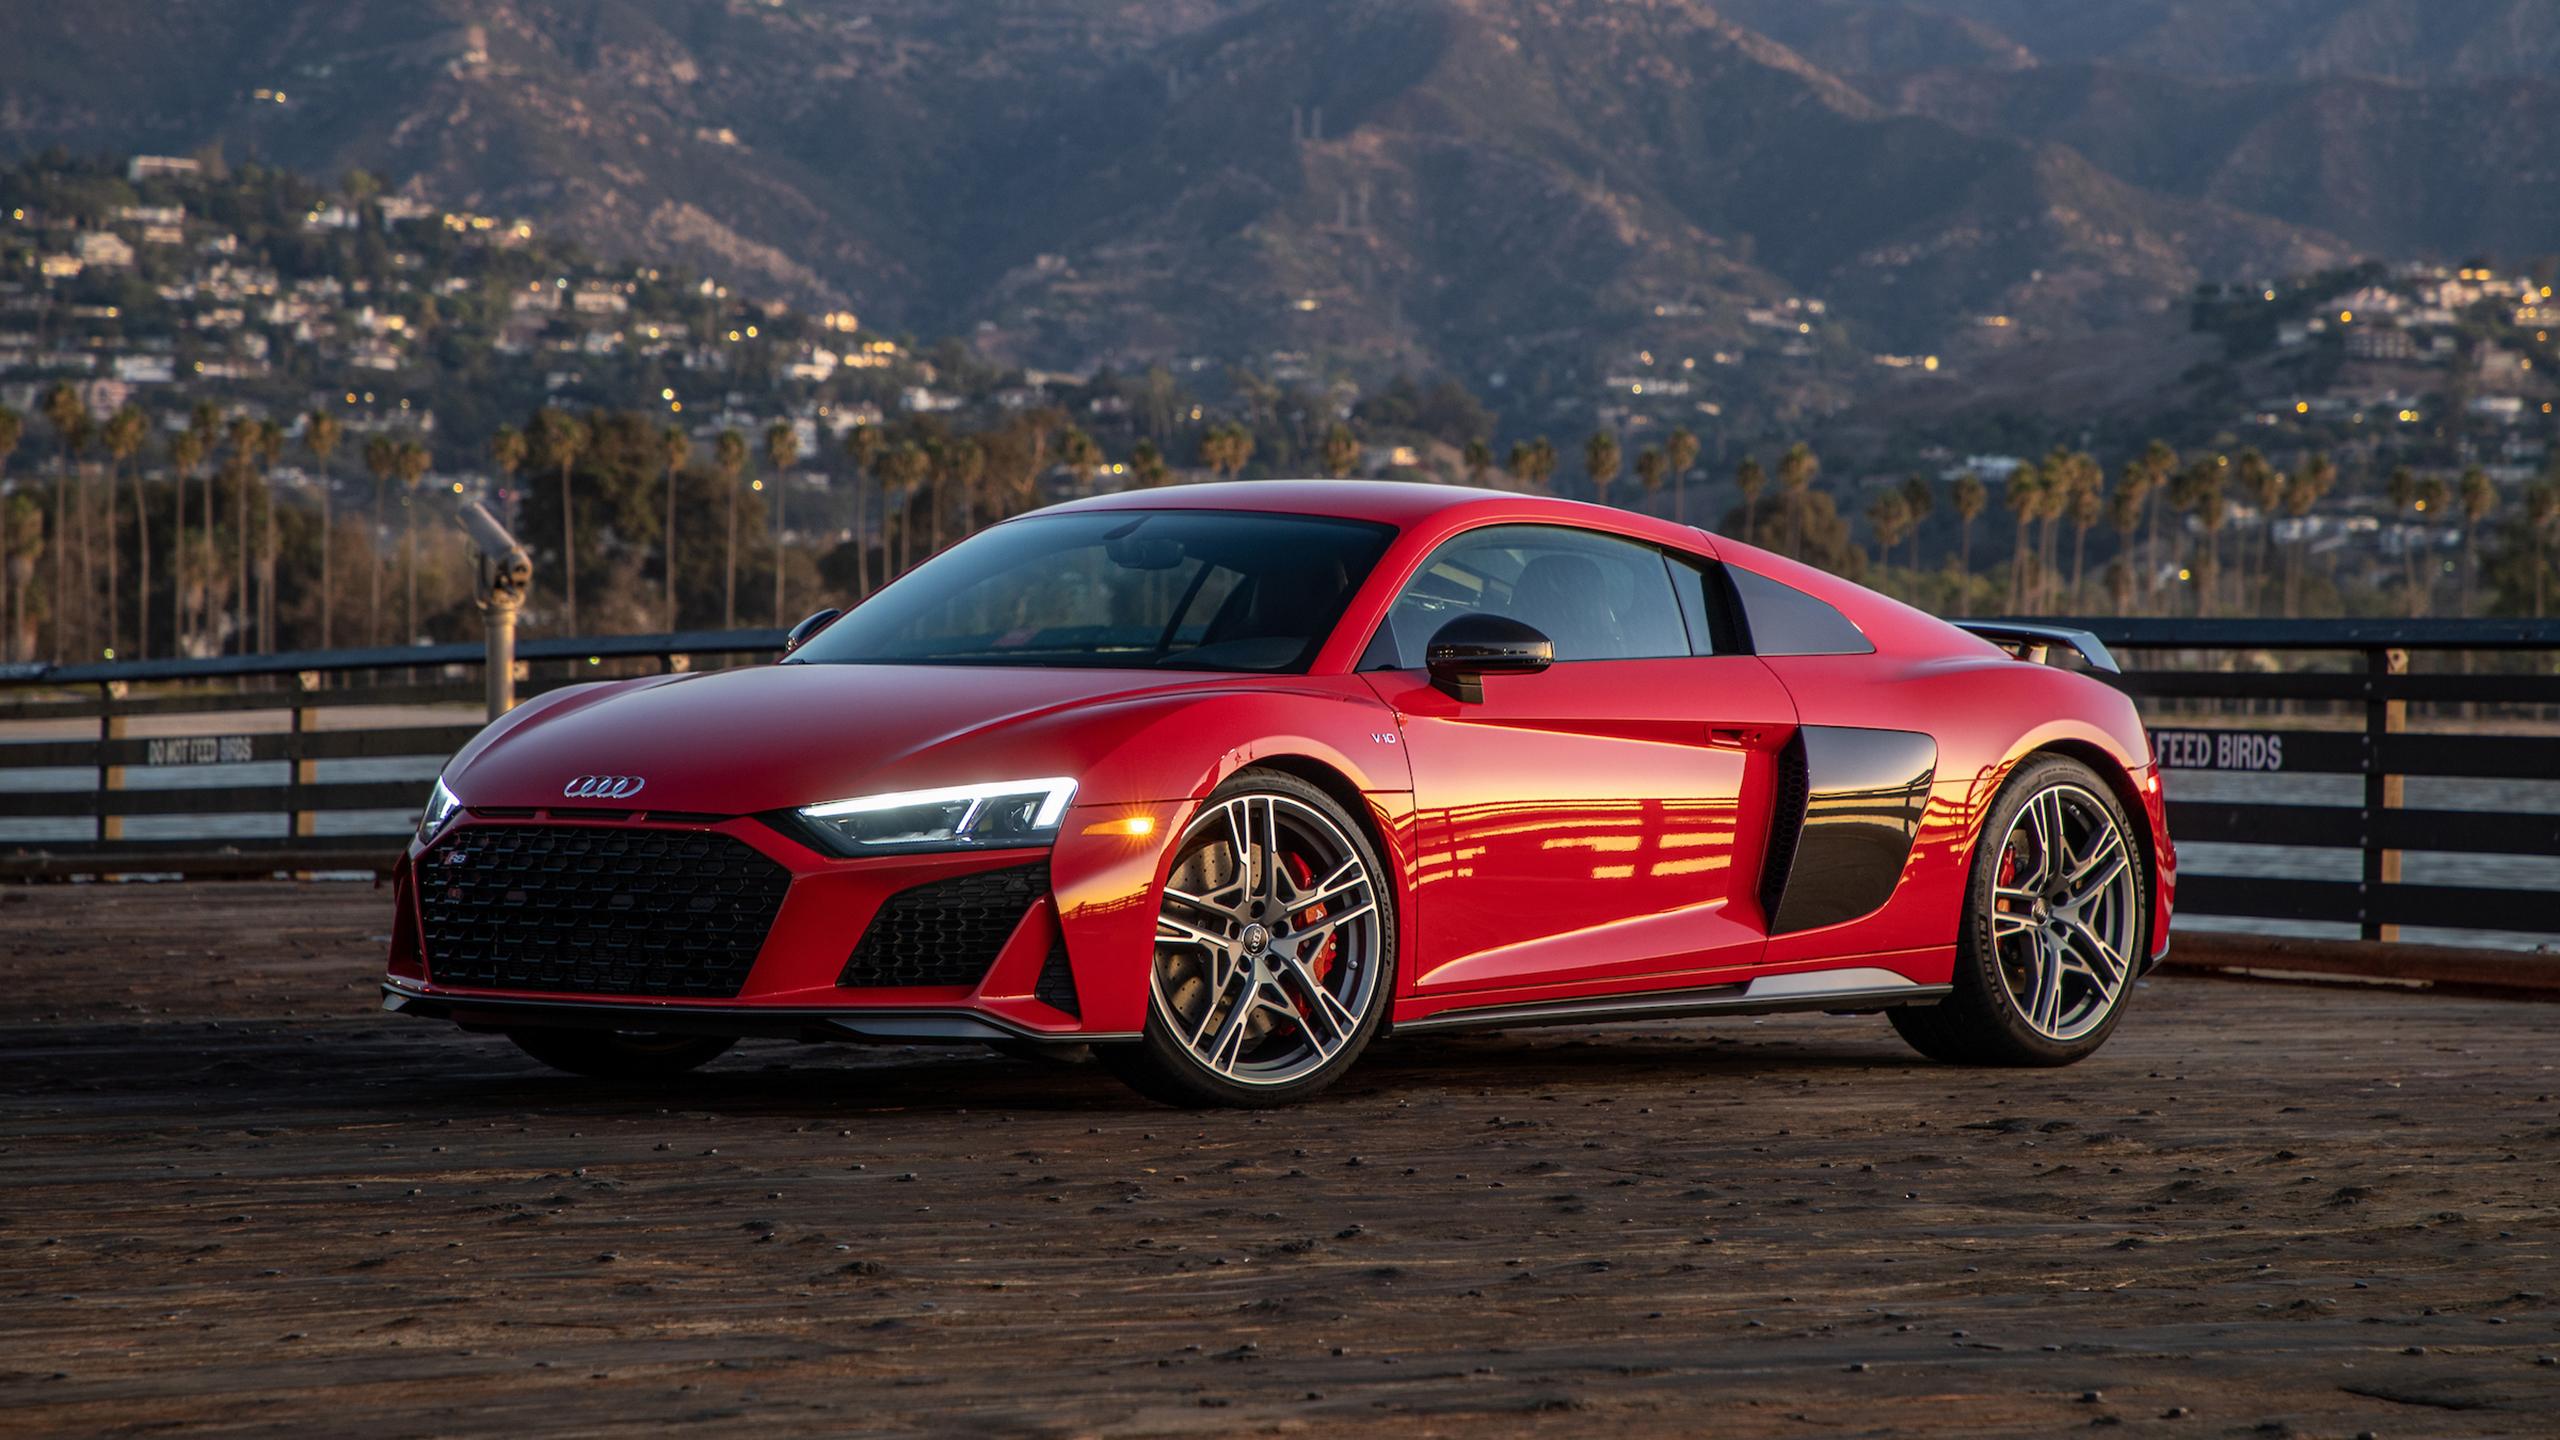 2020 Audi R8 V10 Performance 2 Wallpaper | HD Car ...